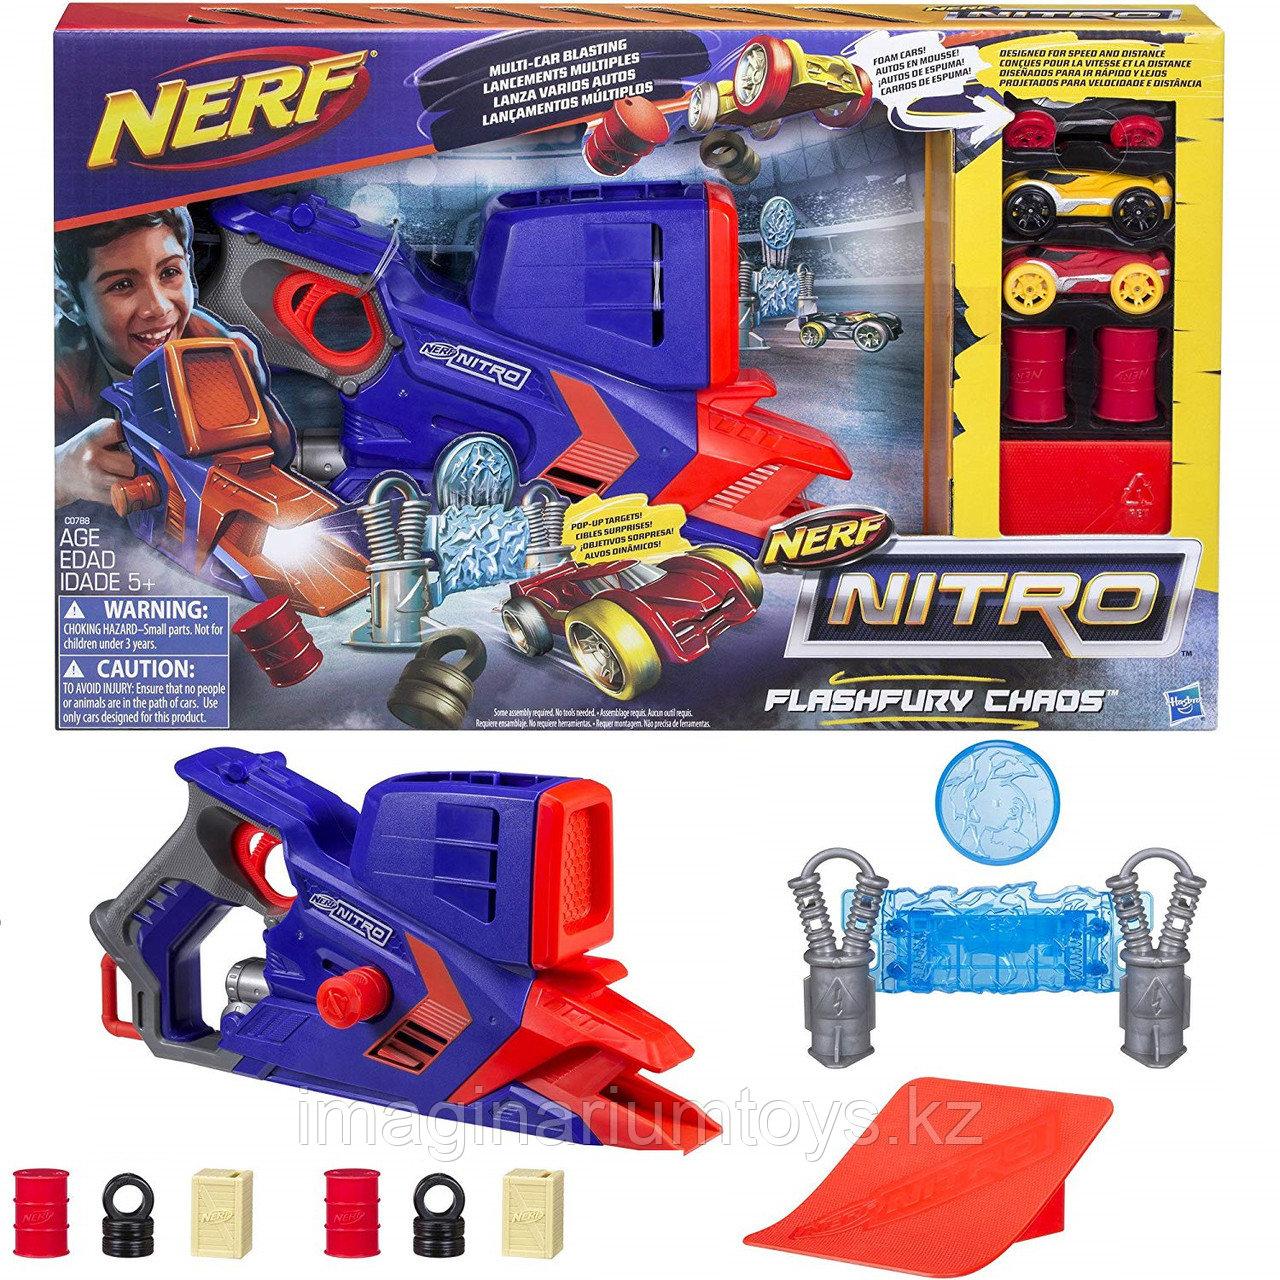 Бластер NERF Nitro «ФЛЕШФЬЮРИ» Flashfury Chaos